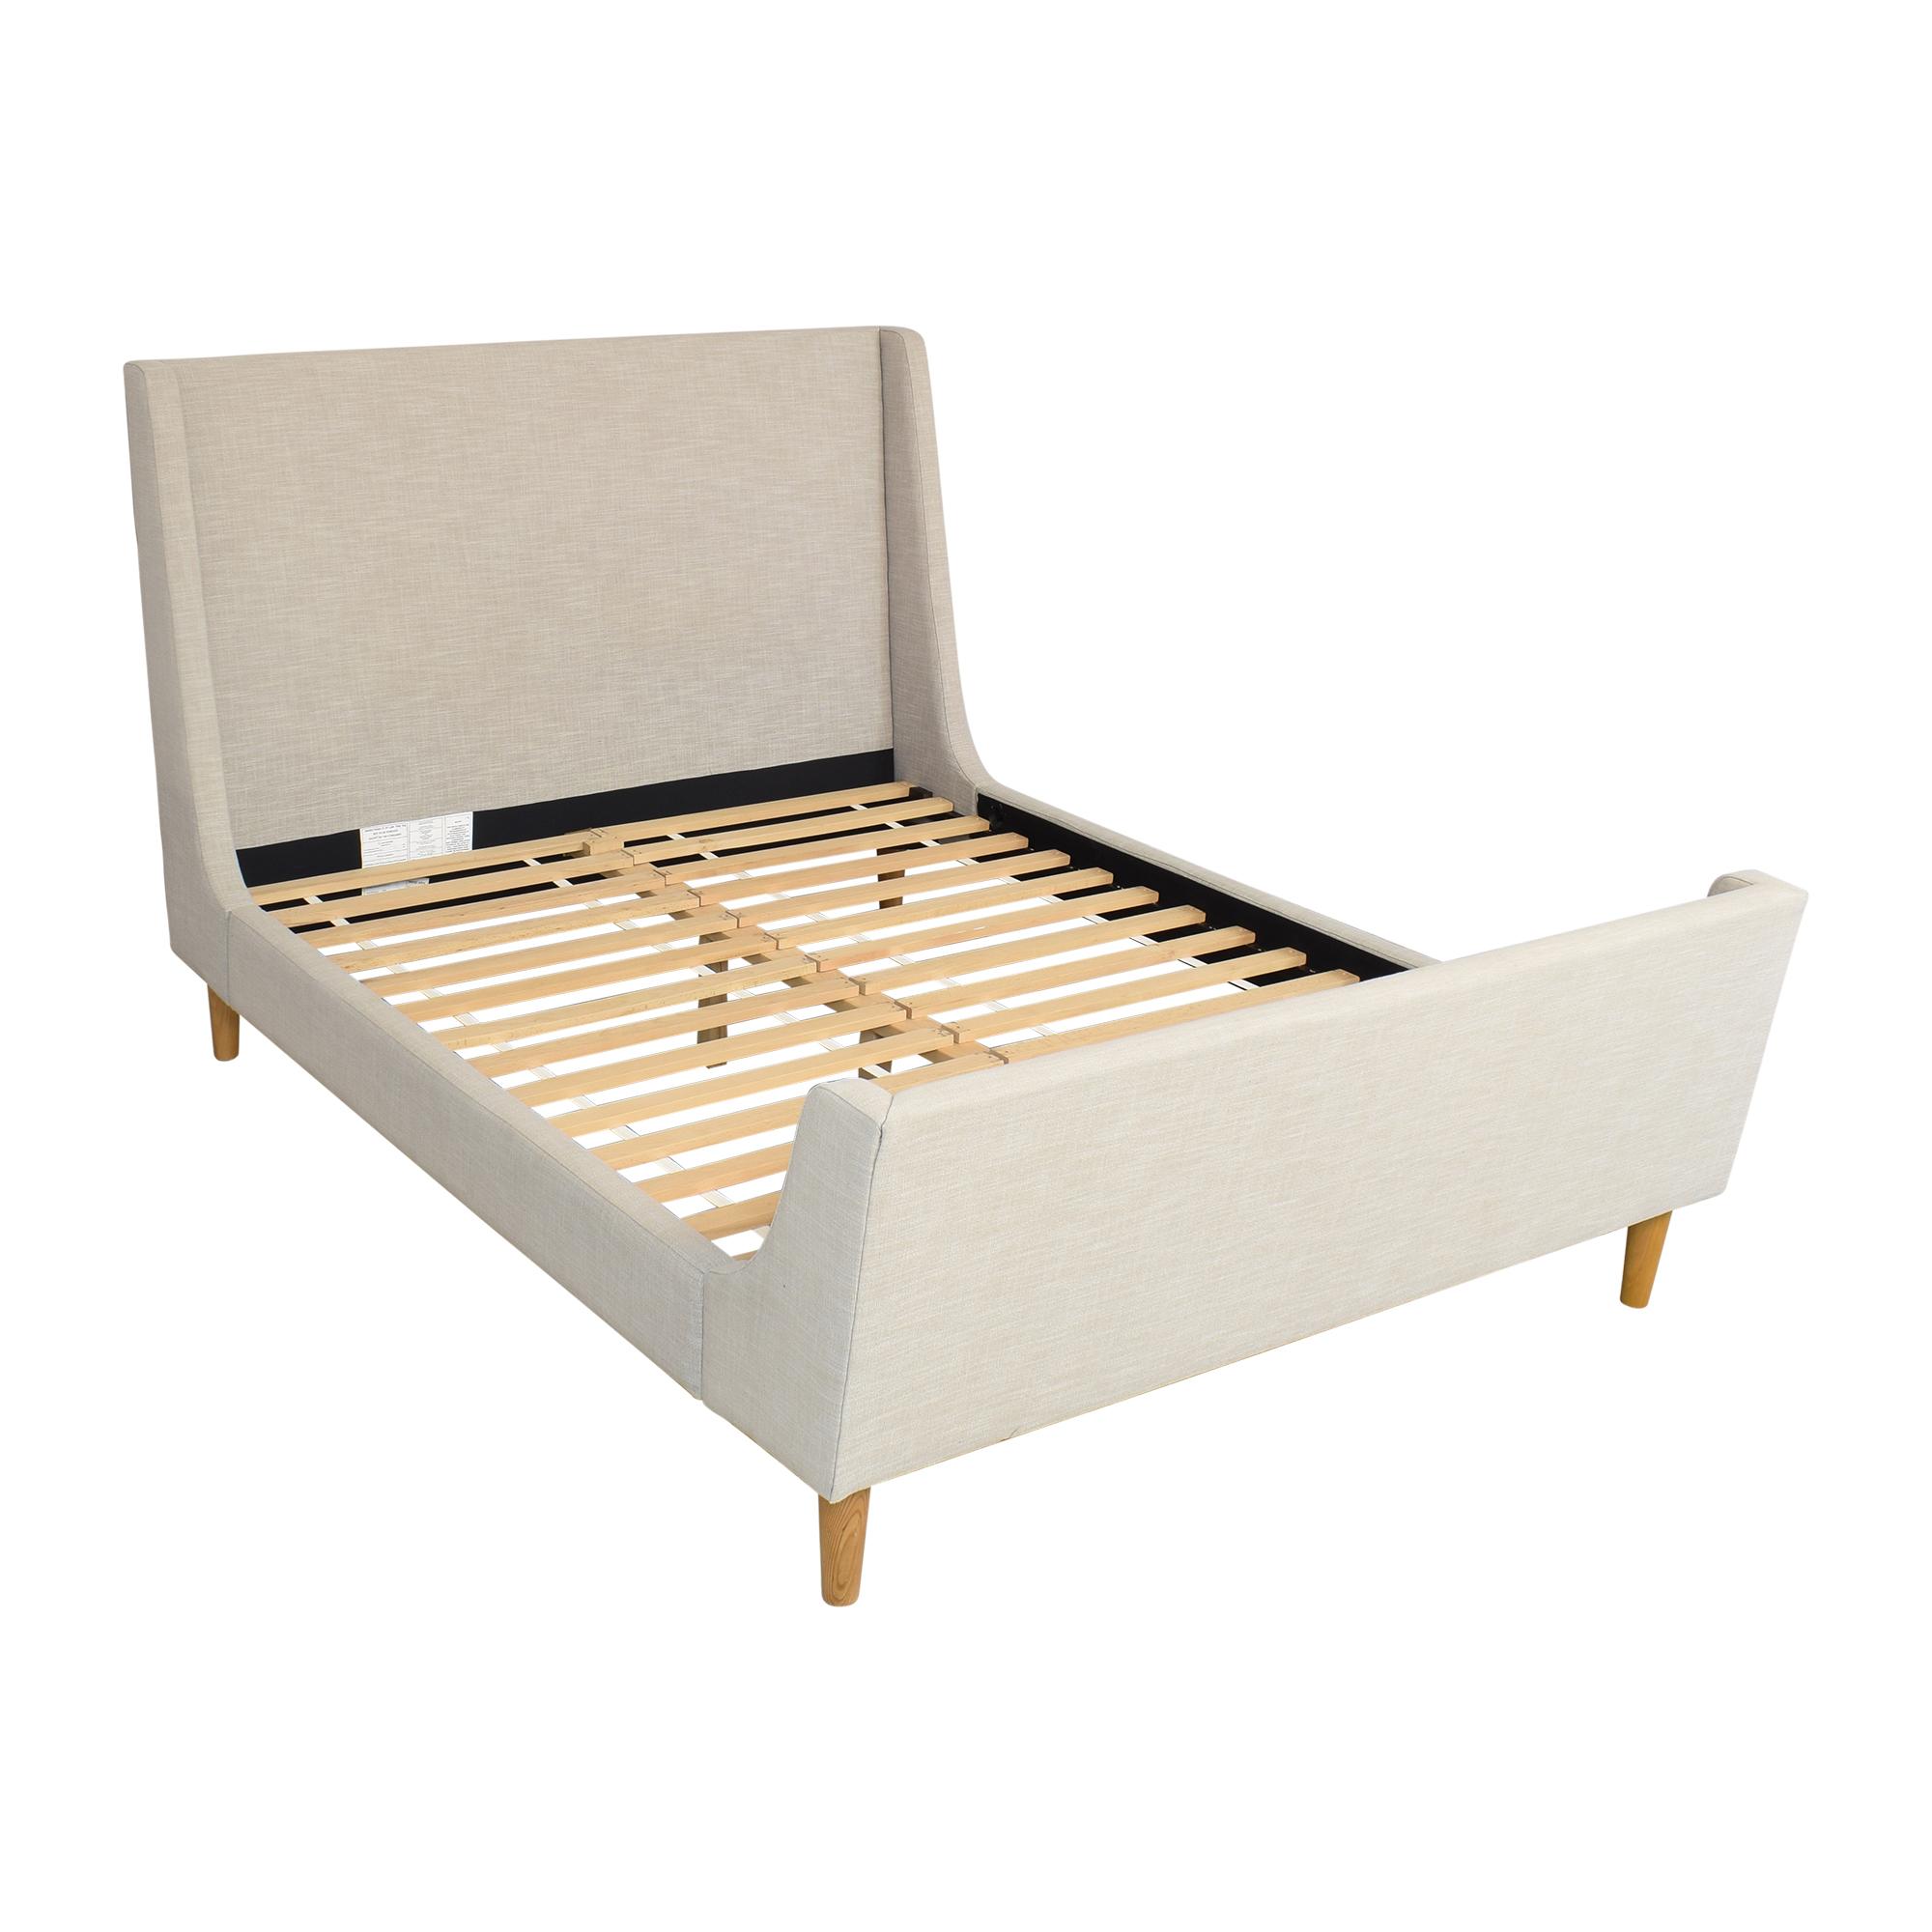 buy West Elm Queen Upholstered Sleigh Bed West Elm Bed Frames